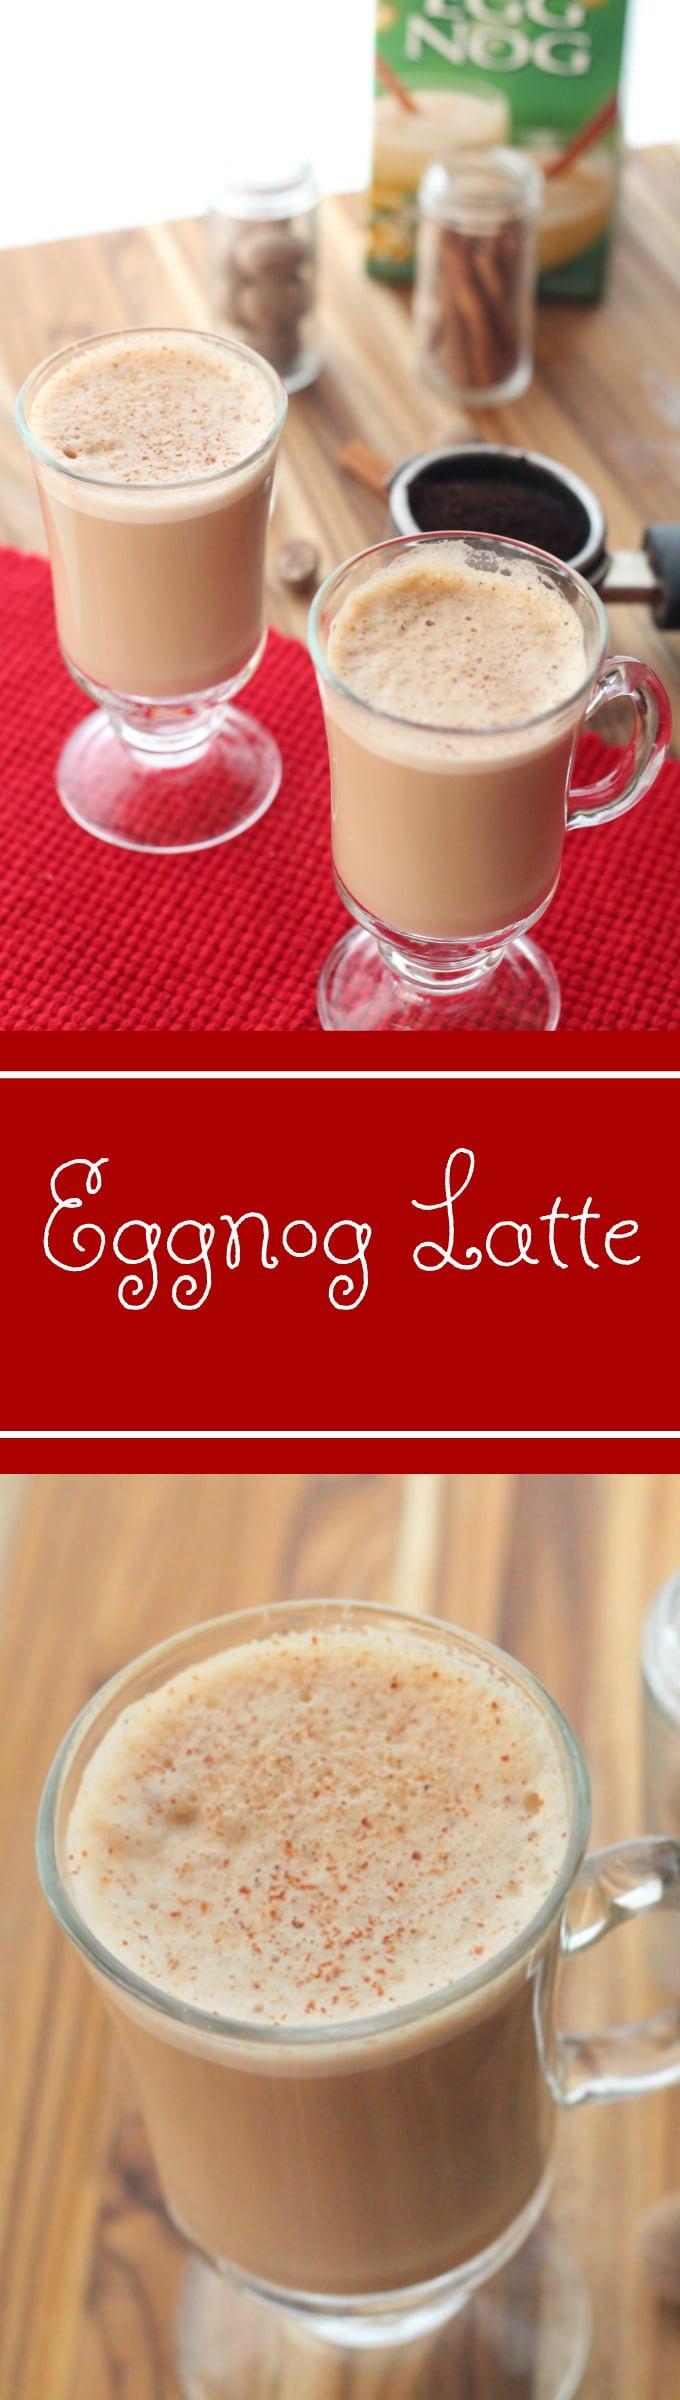 Starbucks copycat eggnog latte recipe. Homemade eggnog latte recipe that is easy and delicious. Plus it saves a little money.